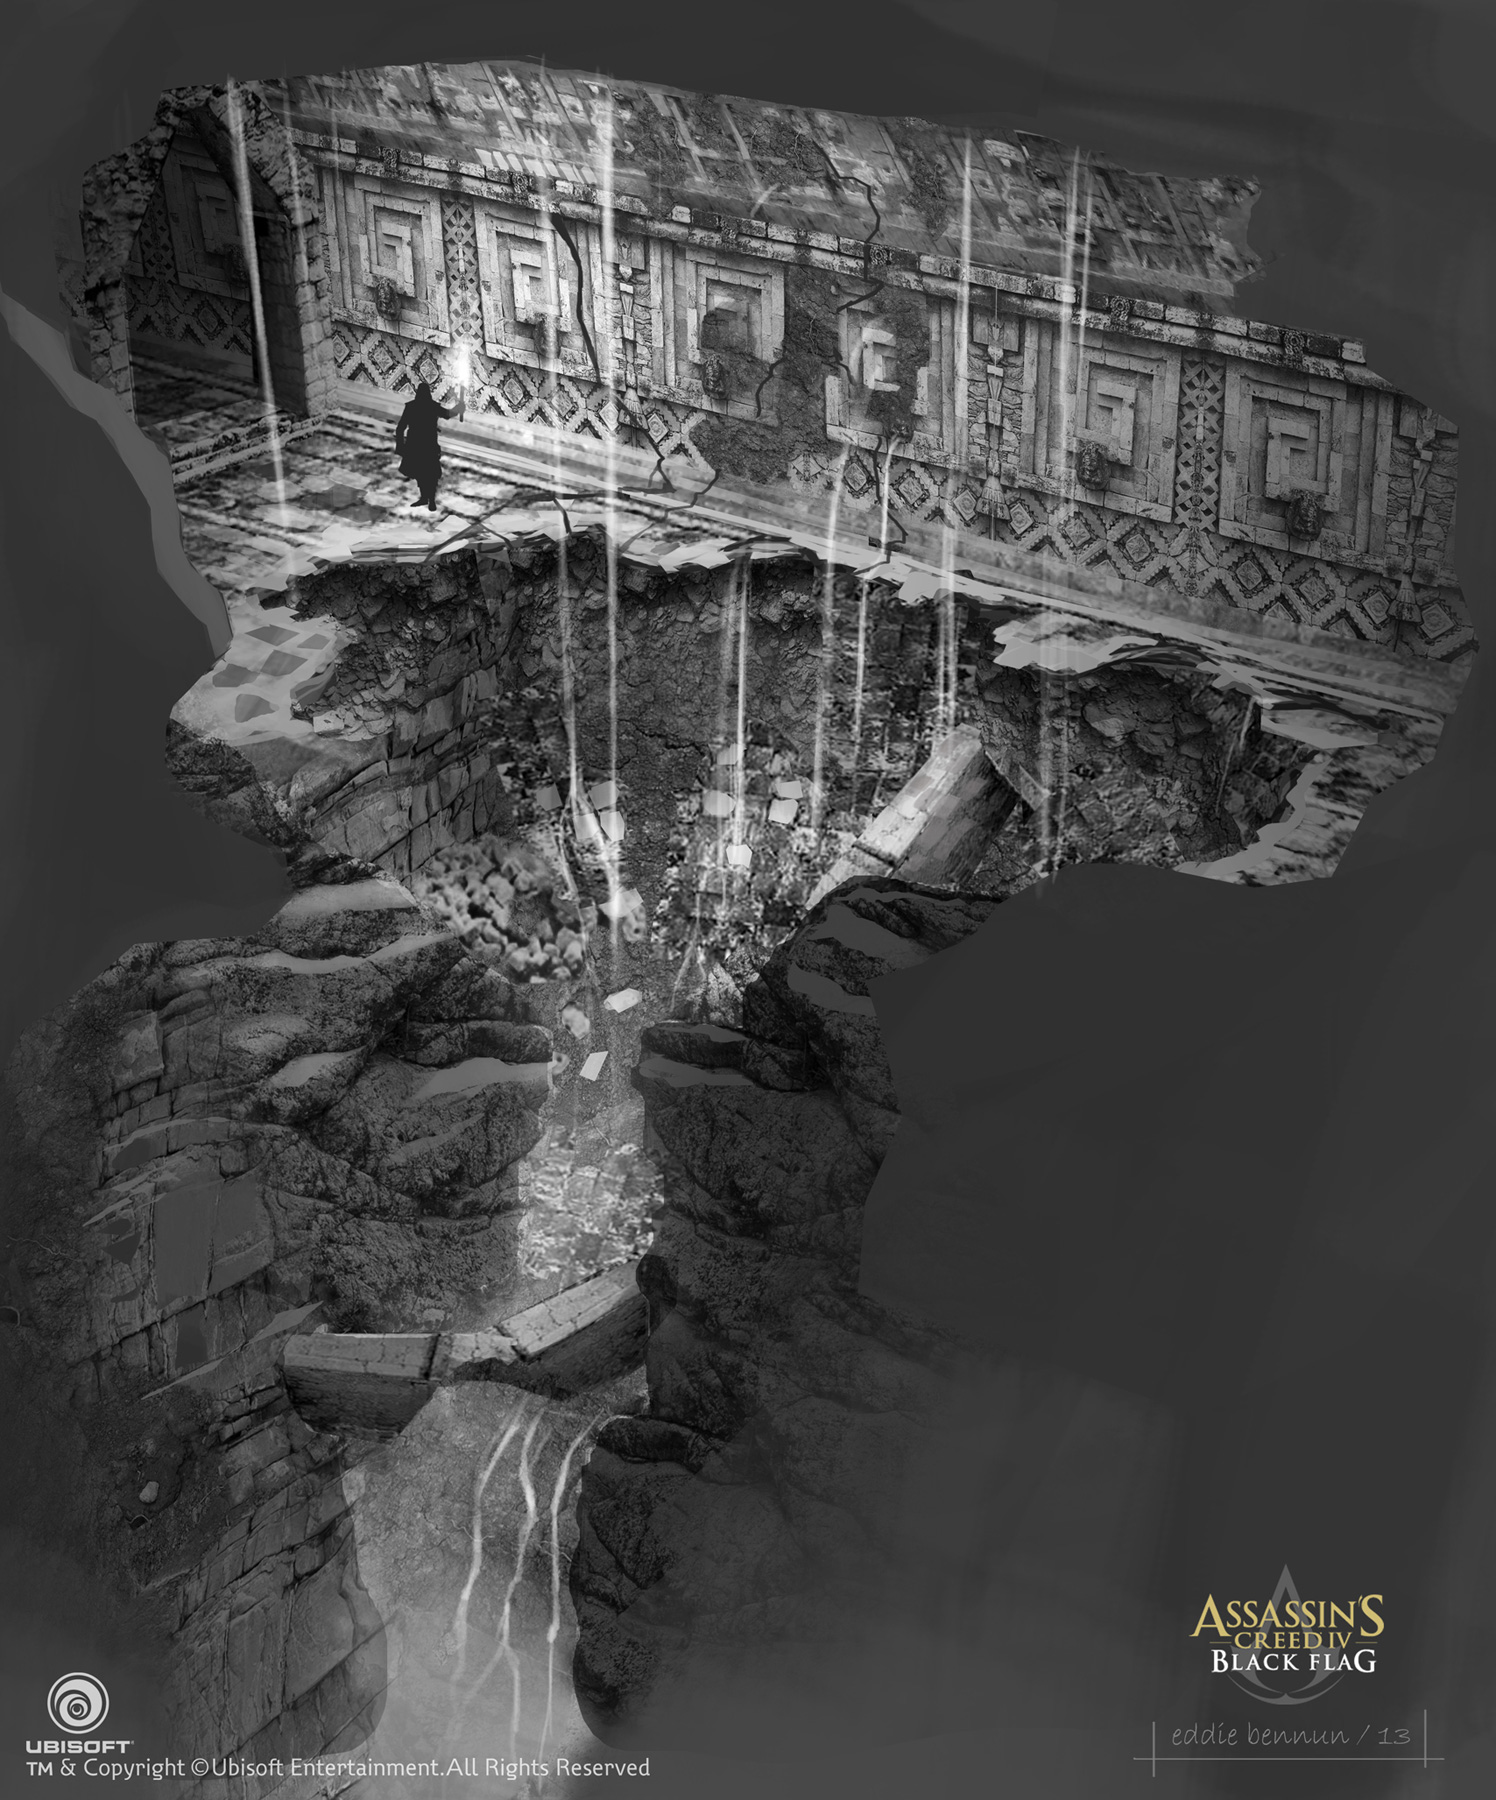 Art: Assassin's Creed IV Black Flag Concept Designs By Eddie